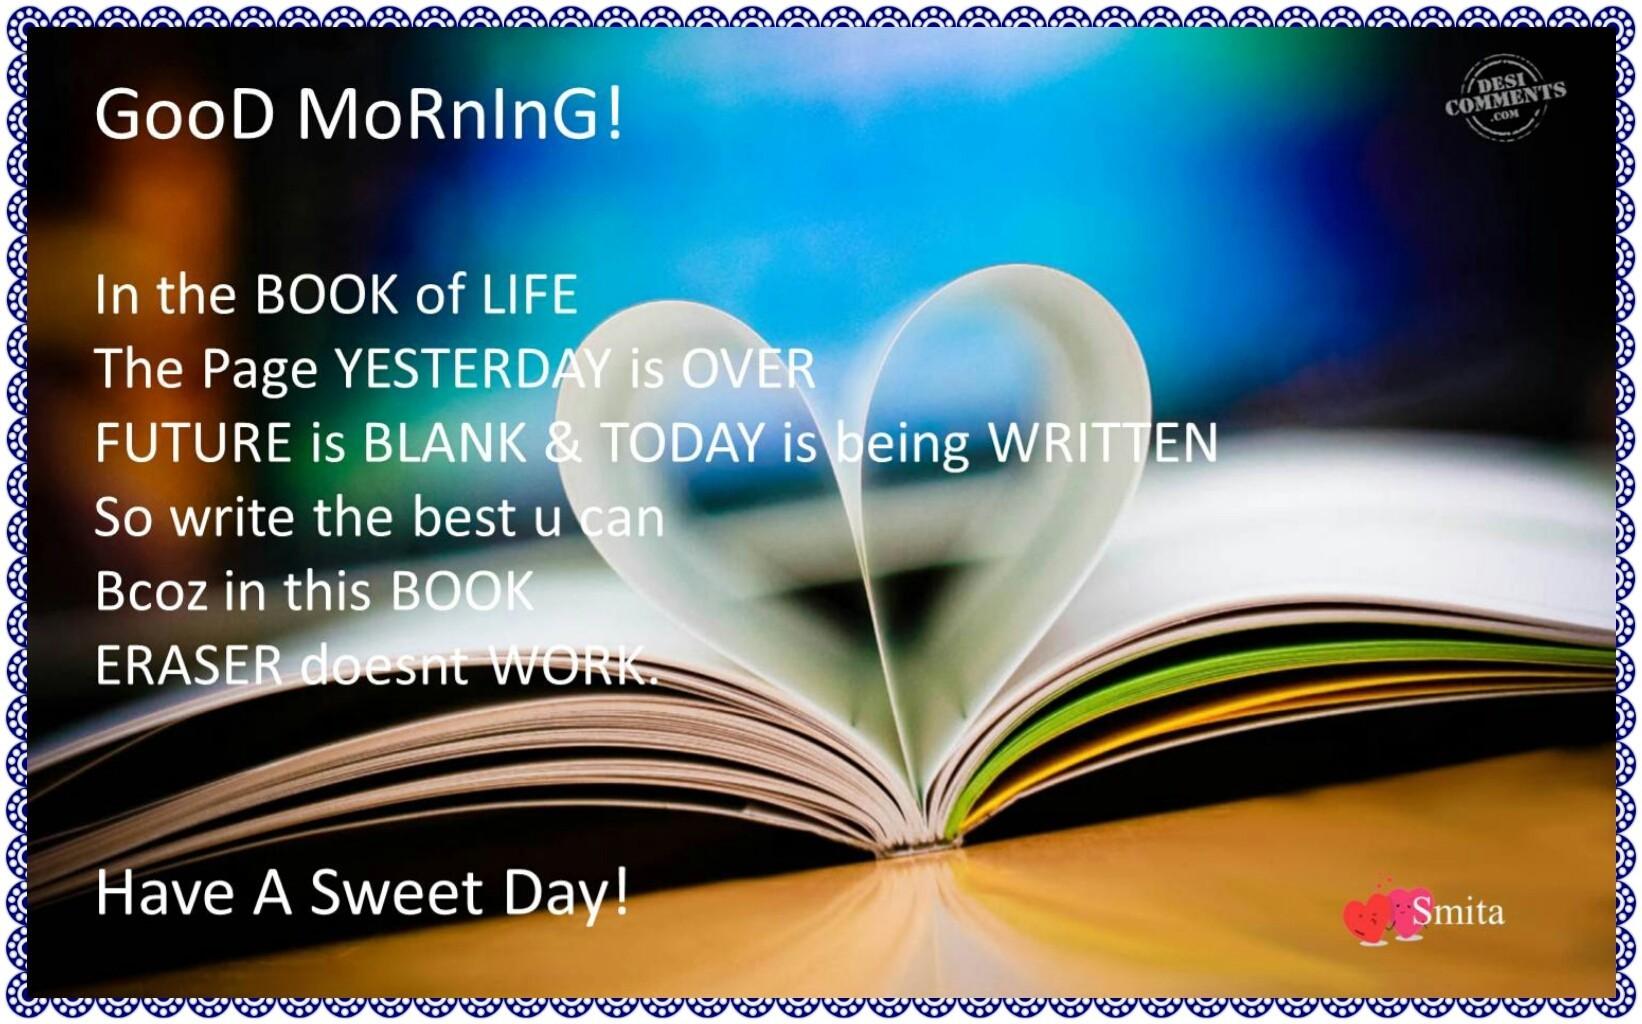 Good Morning Have A Sweet Day Tumblr thumbnail